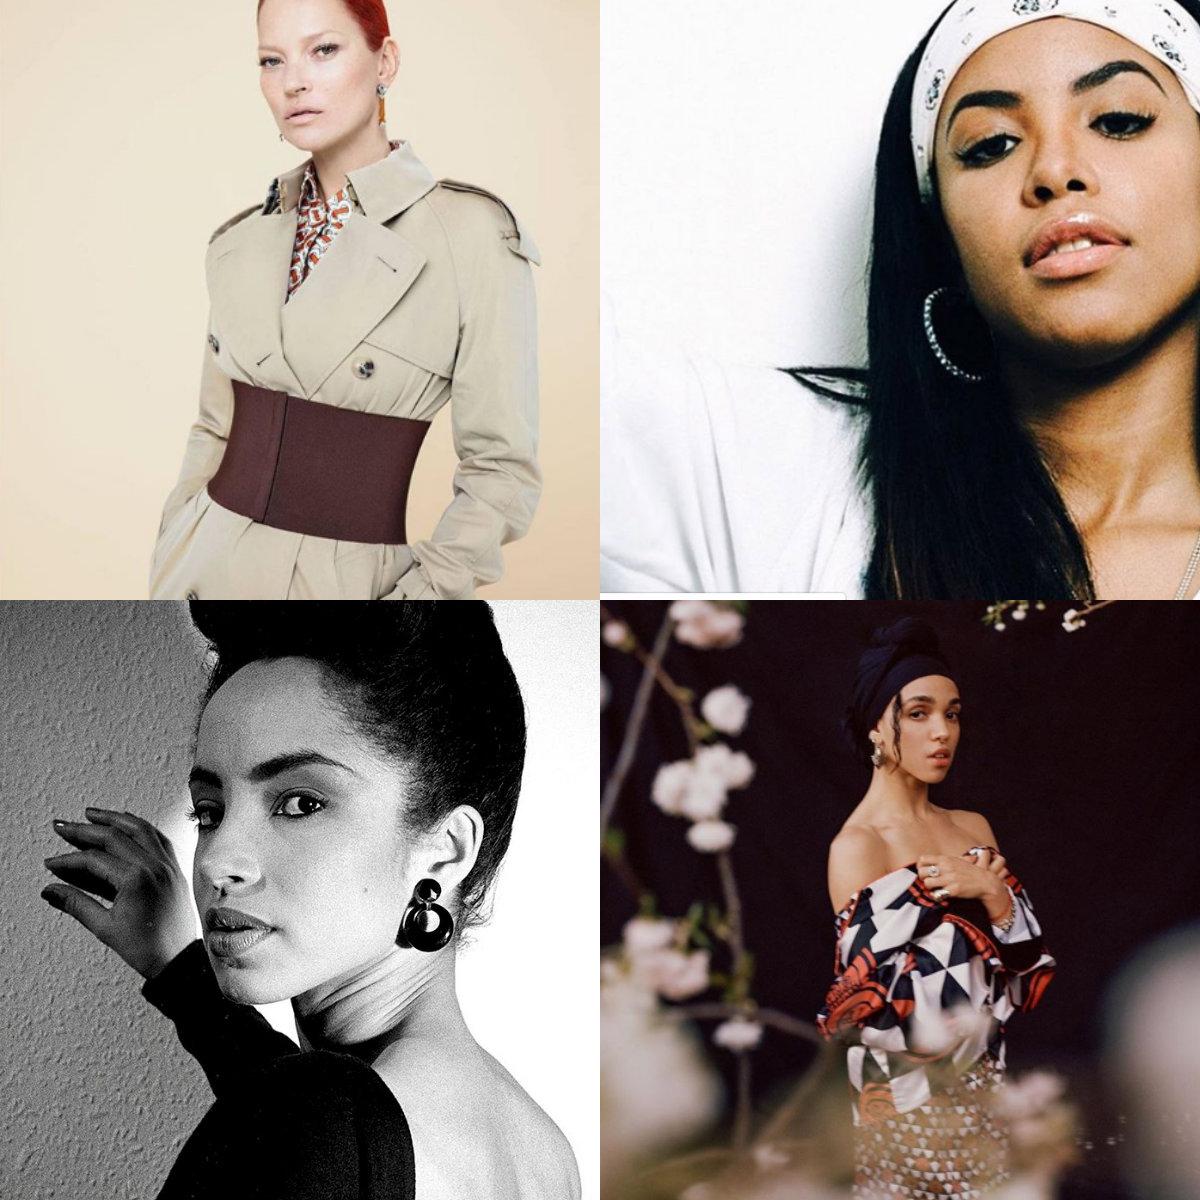 Kate Moss, Aaliyah Dana Haughton, Sade Adu e FKA Twigs